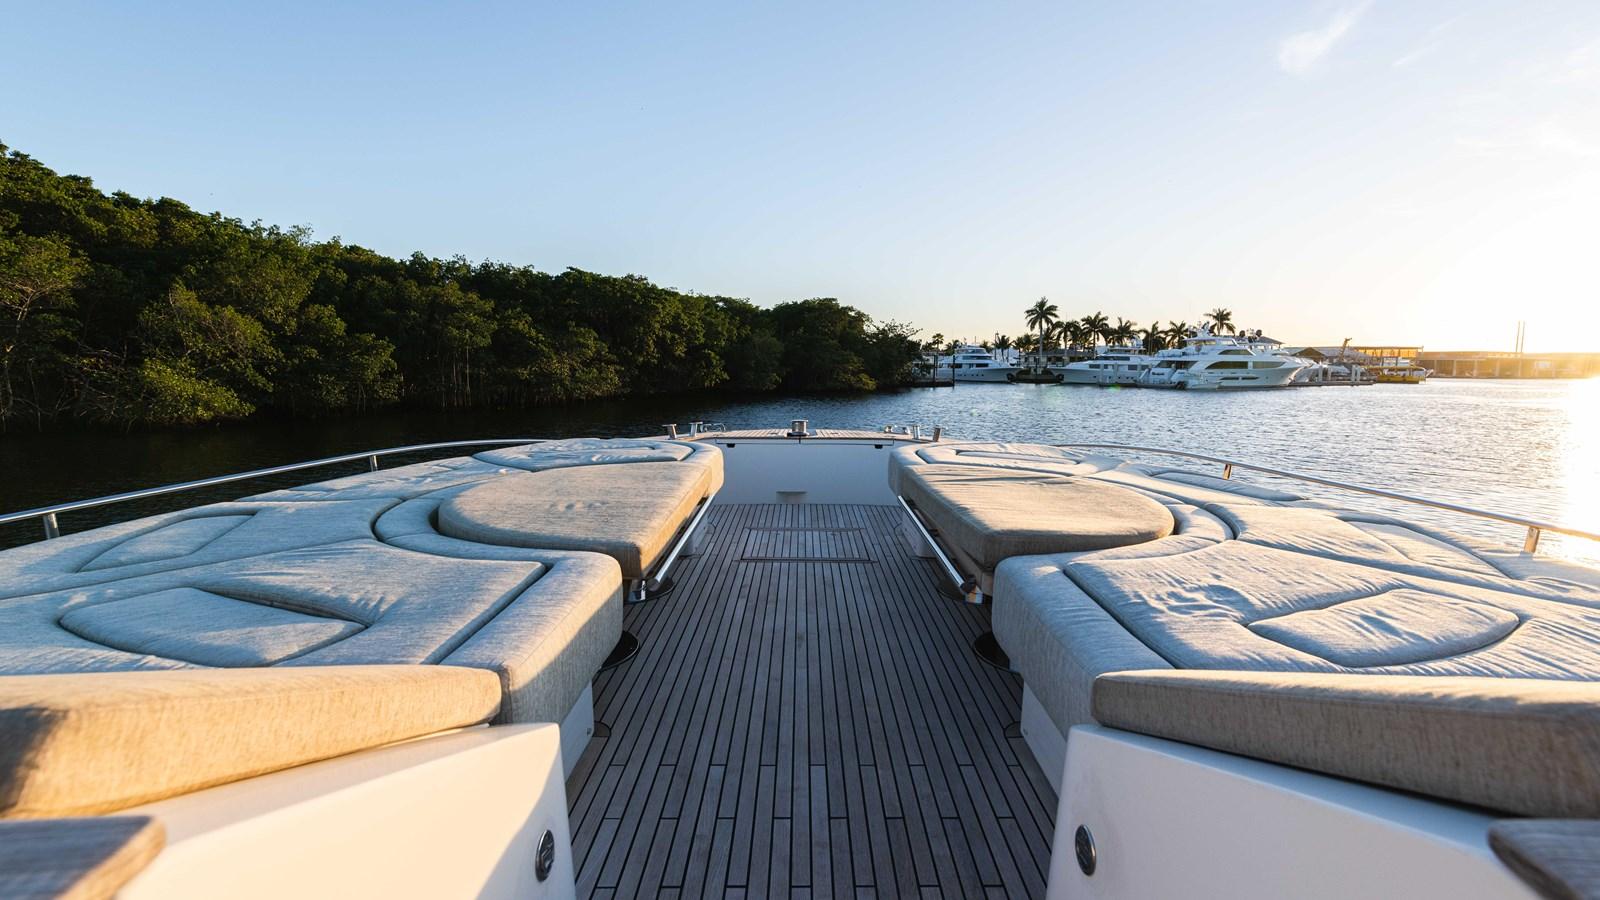 76 Monte Carlo (69 of 127) 2014 MONTE CARLO YACHTS Motoryacht Motor Yacht 2825078